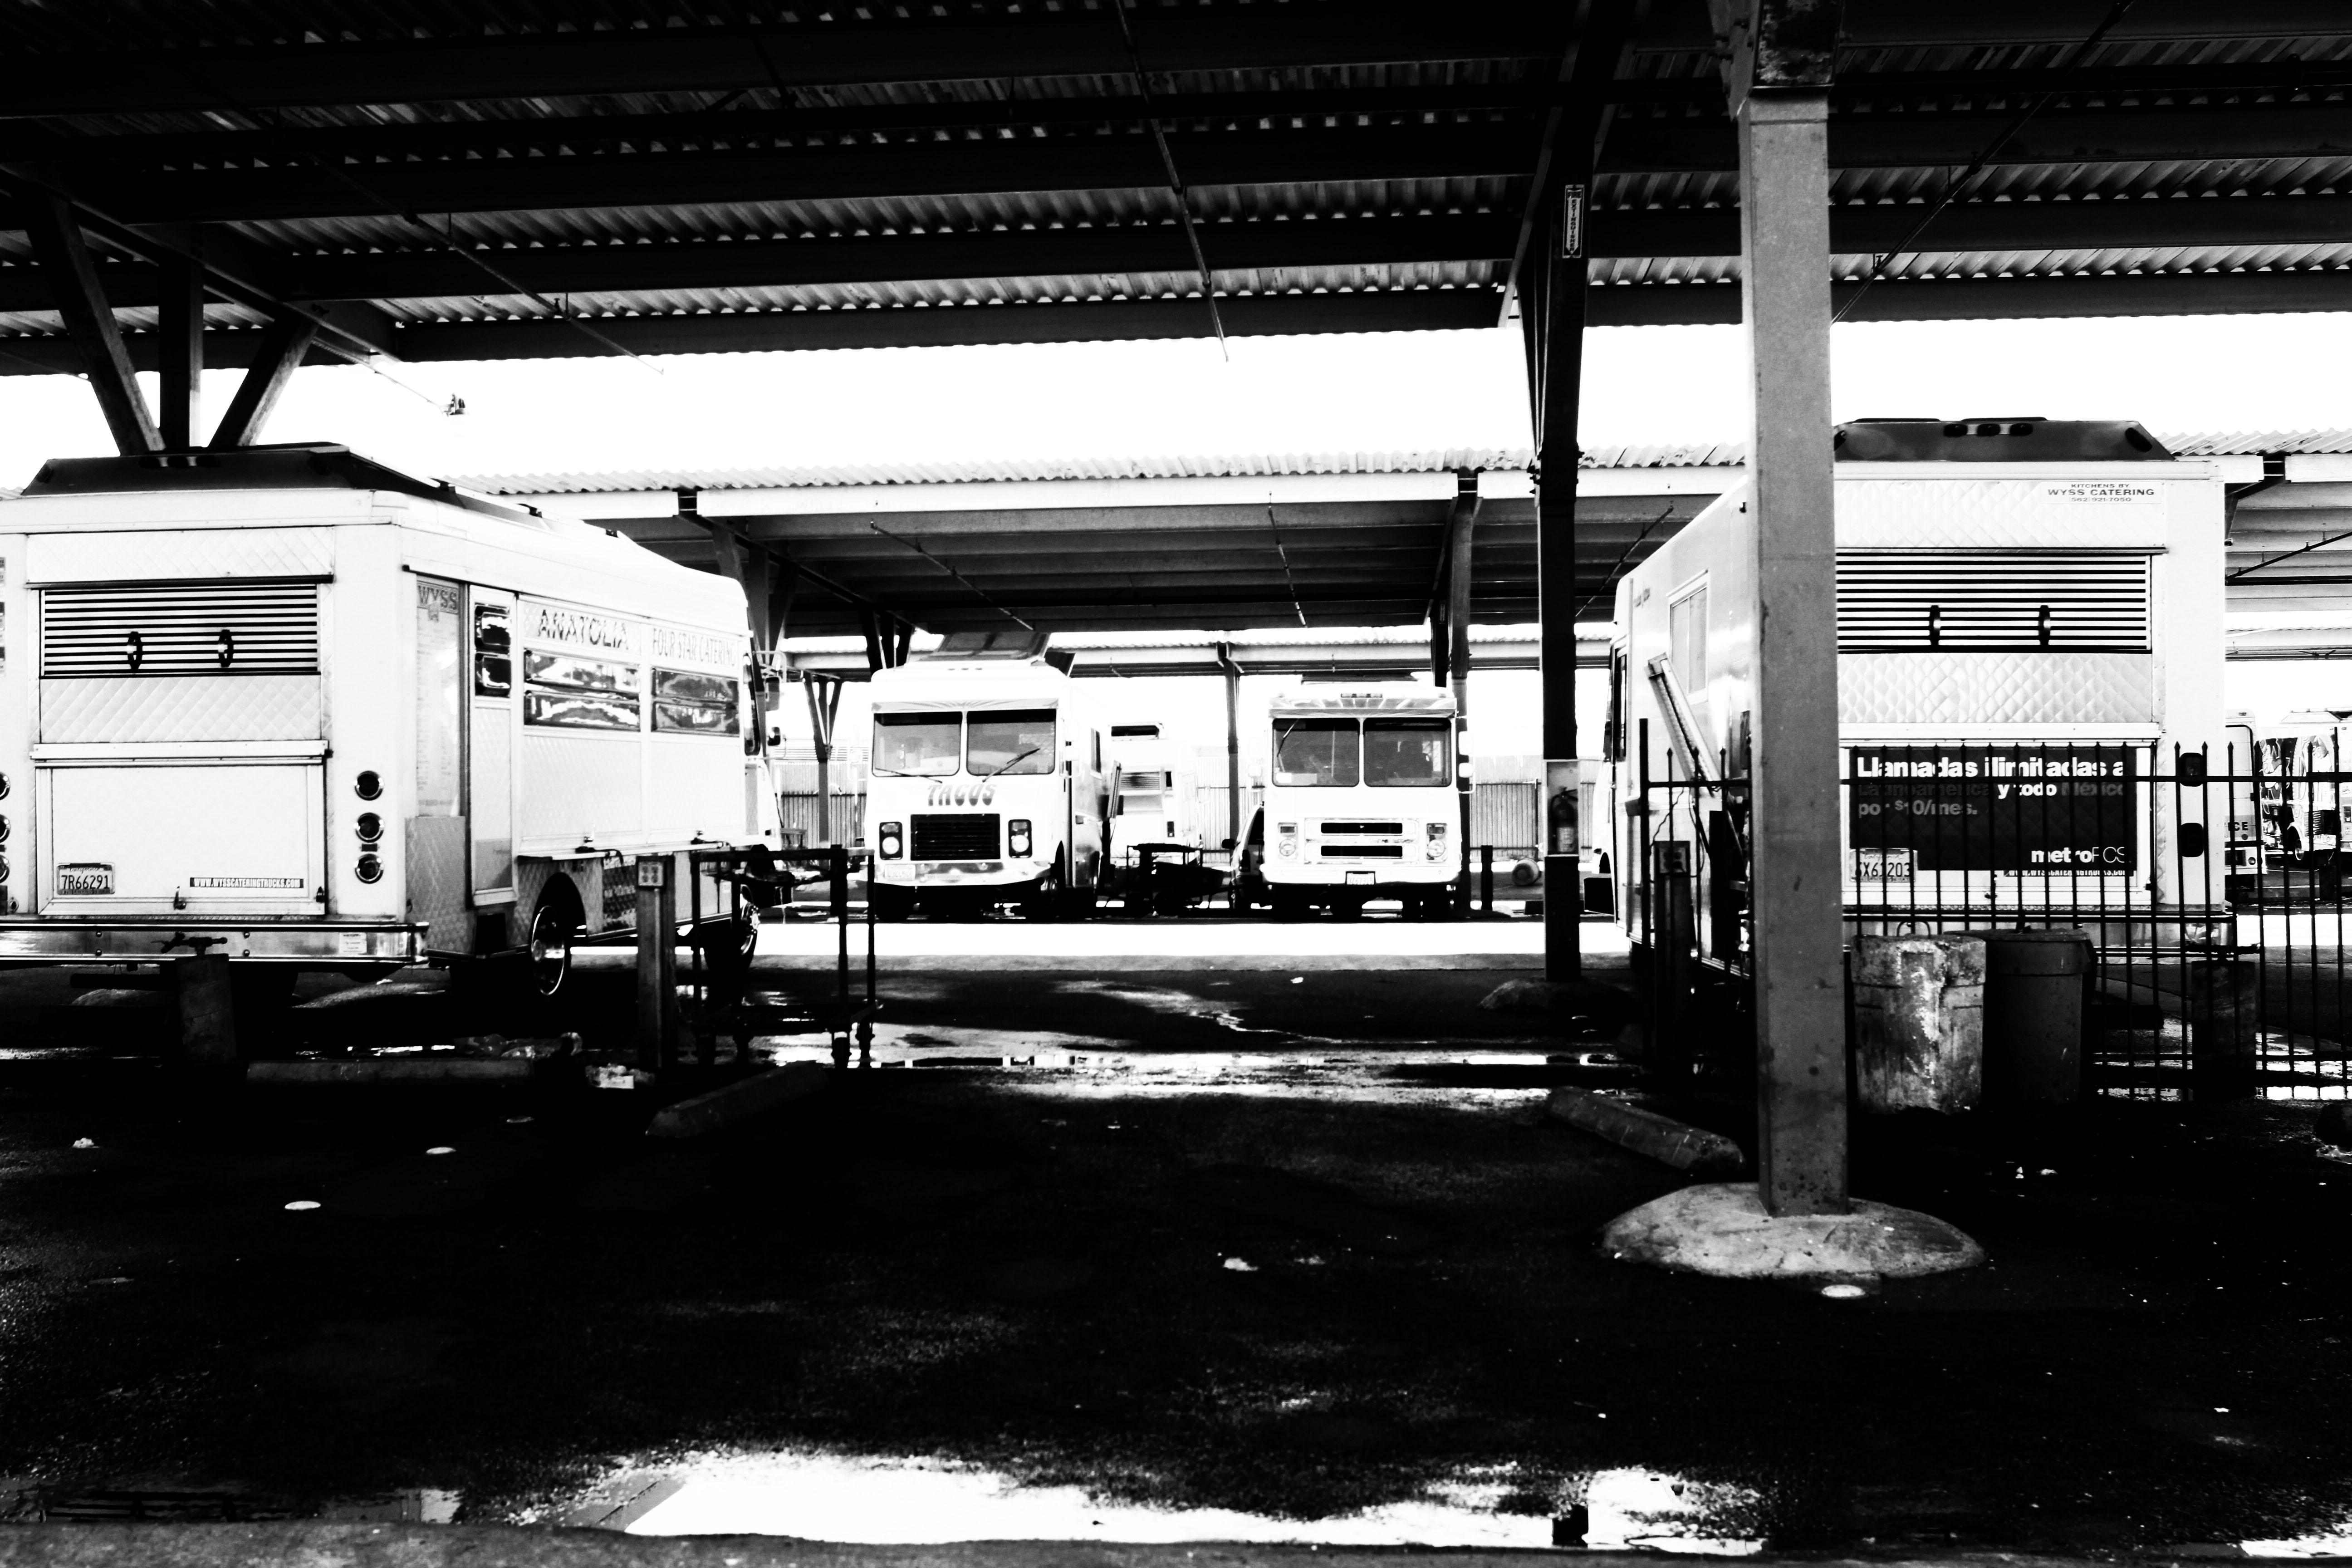 Commissary, Sacramento, CA